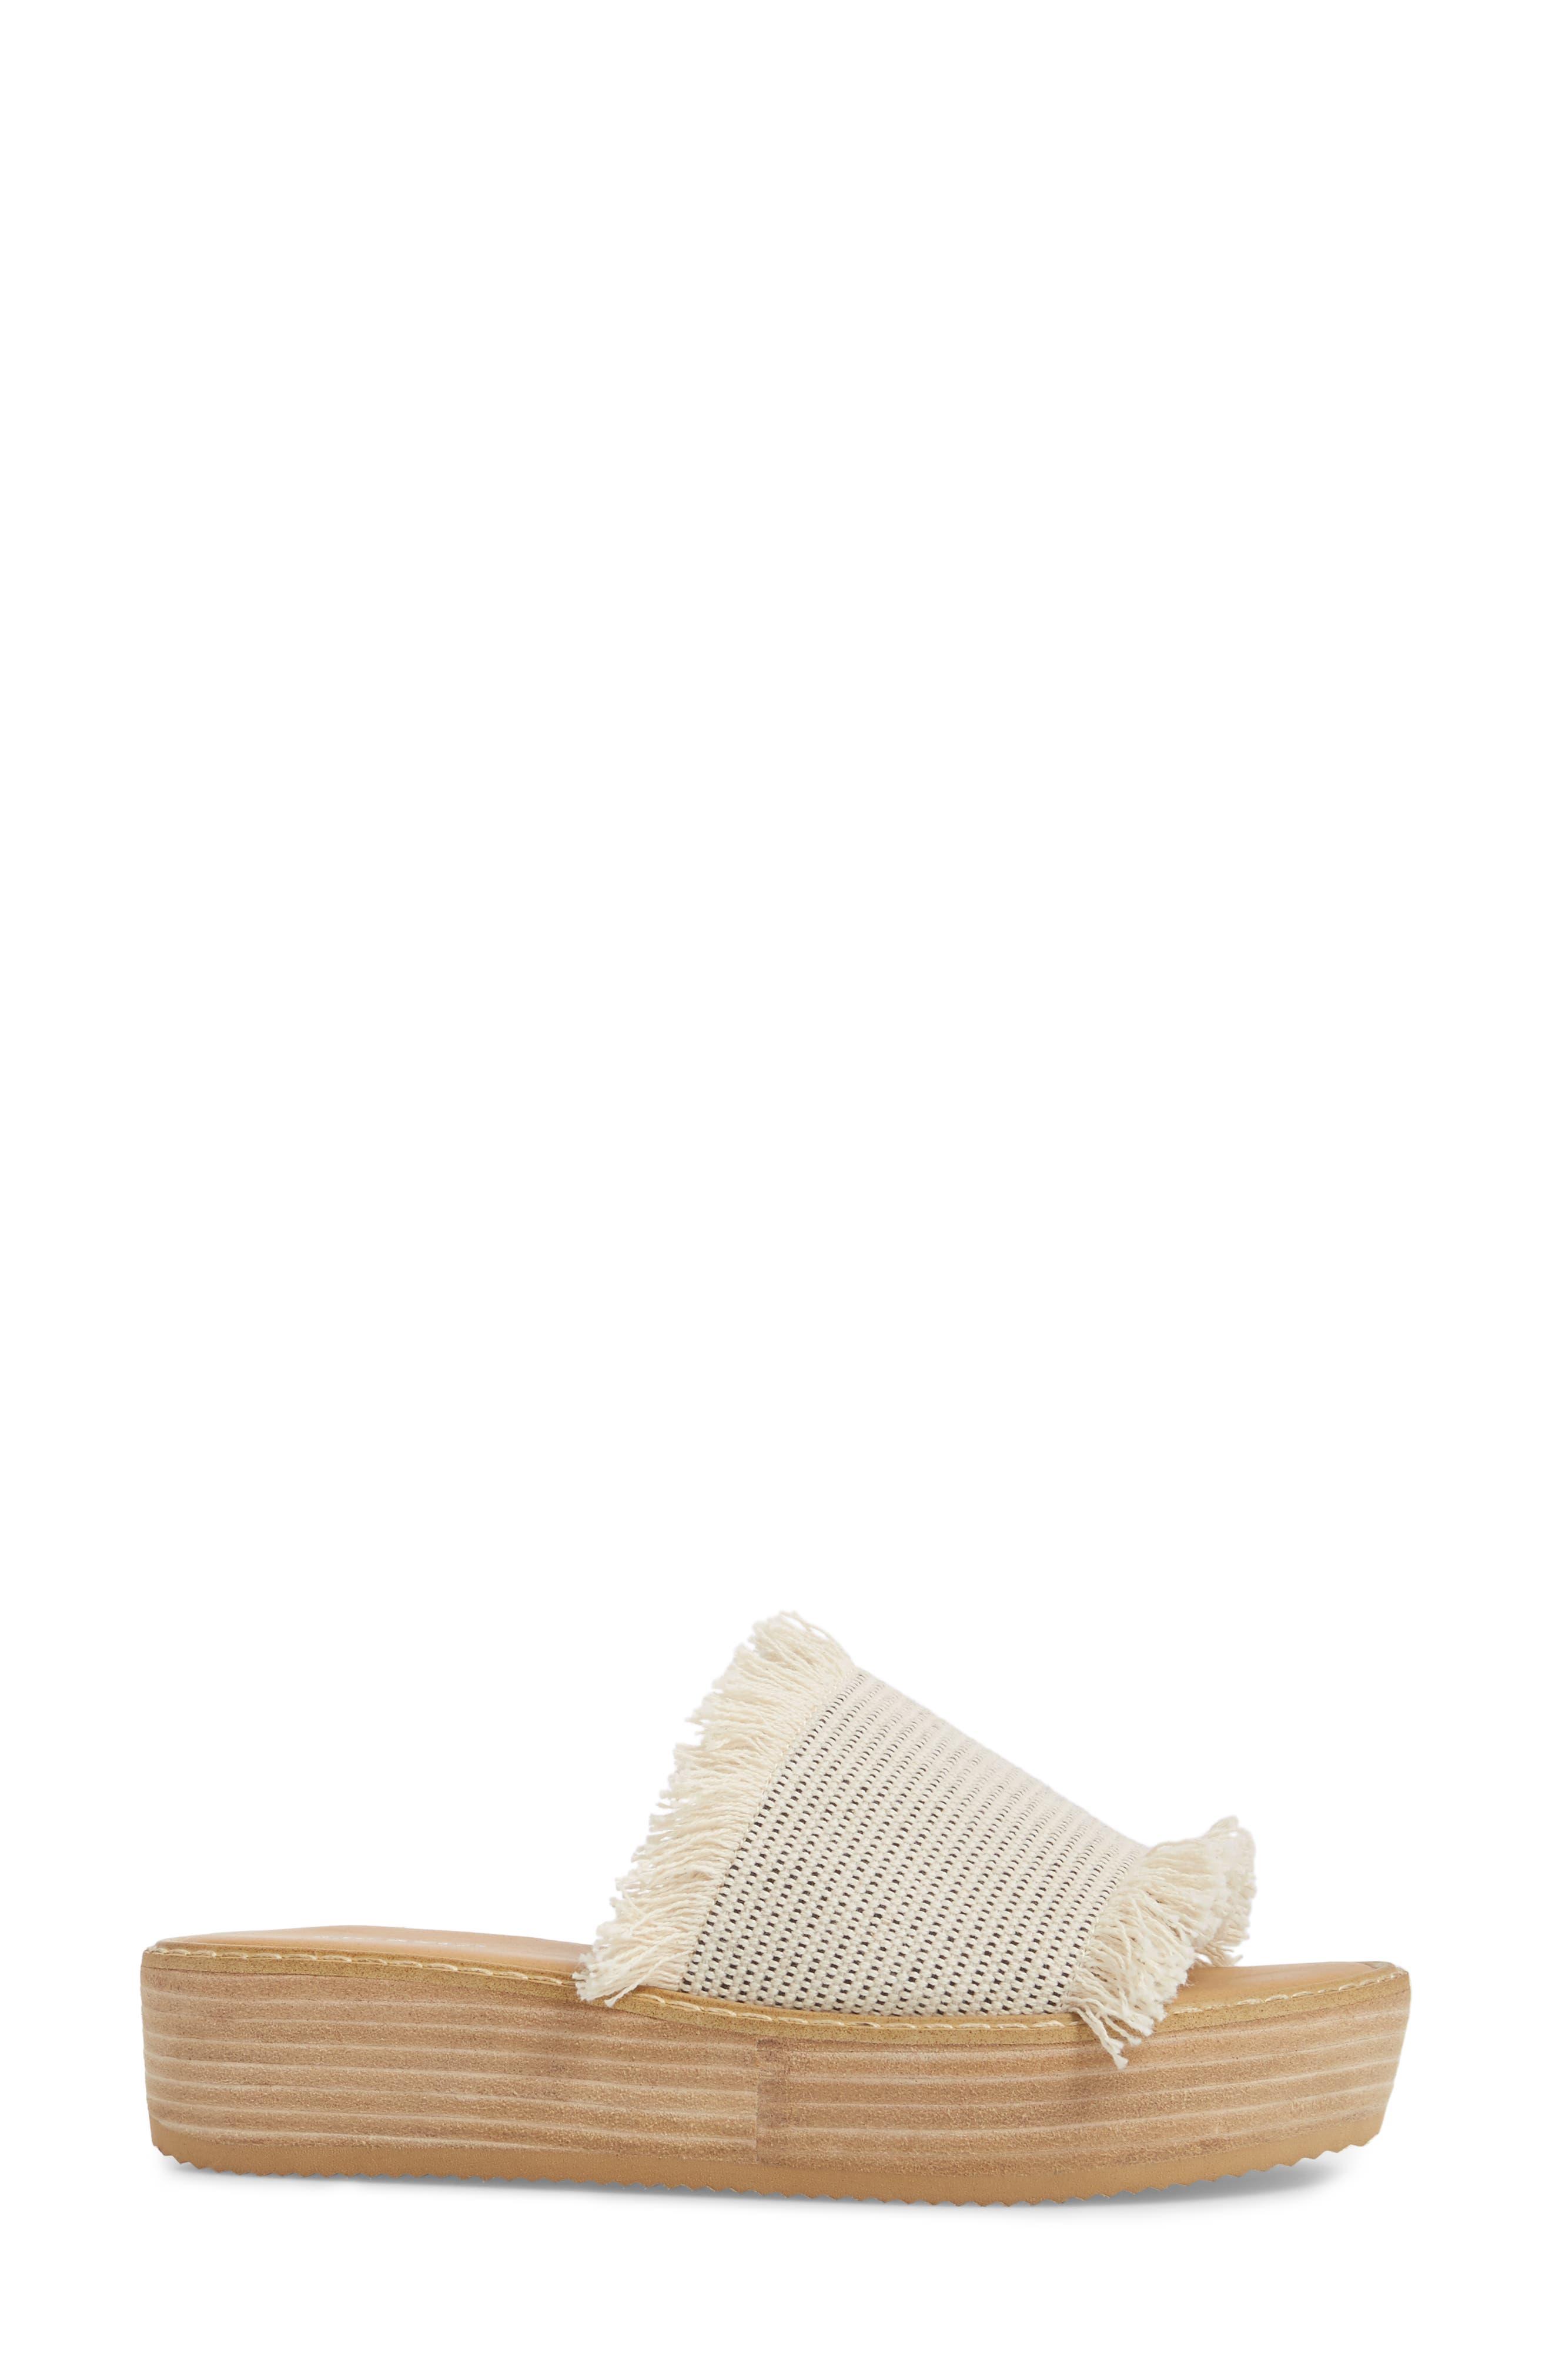 Ebony Platform Sandal,                             Alternate thumbnail 3, color,                             White/ Black Osaka Fabric